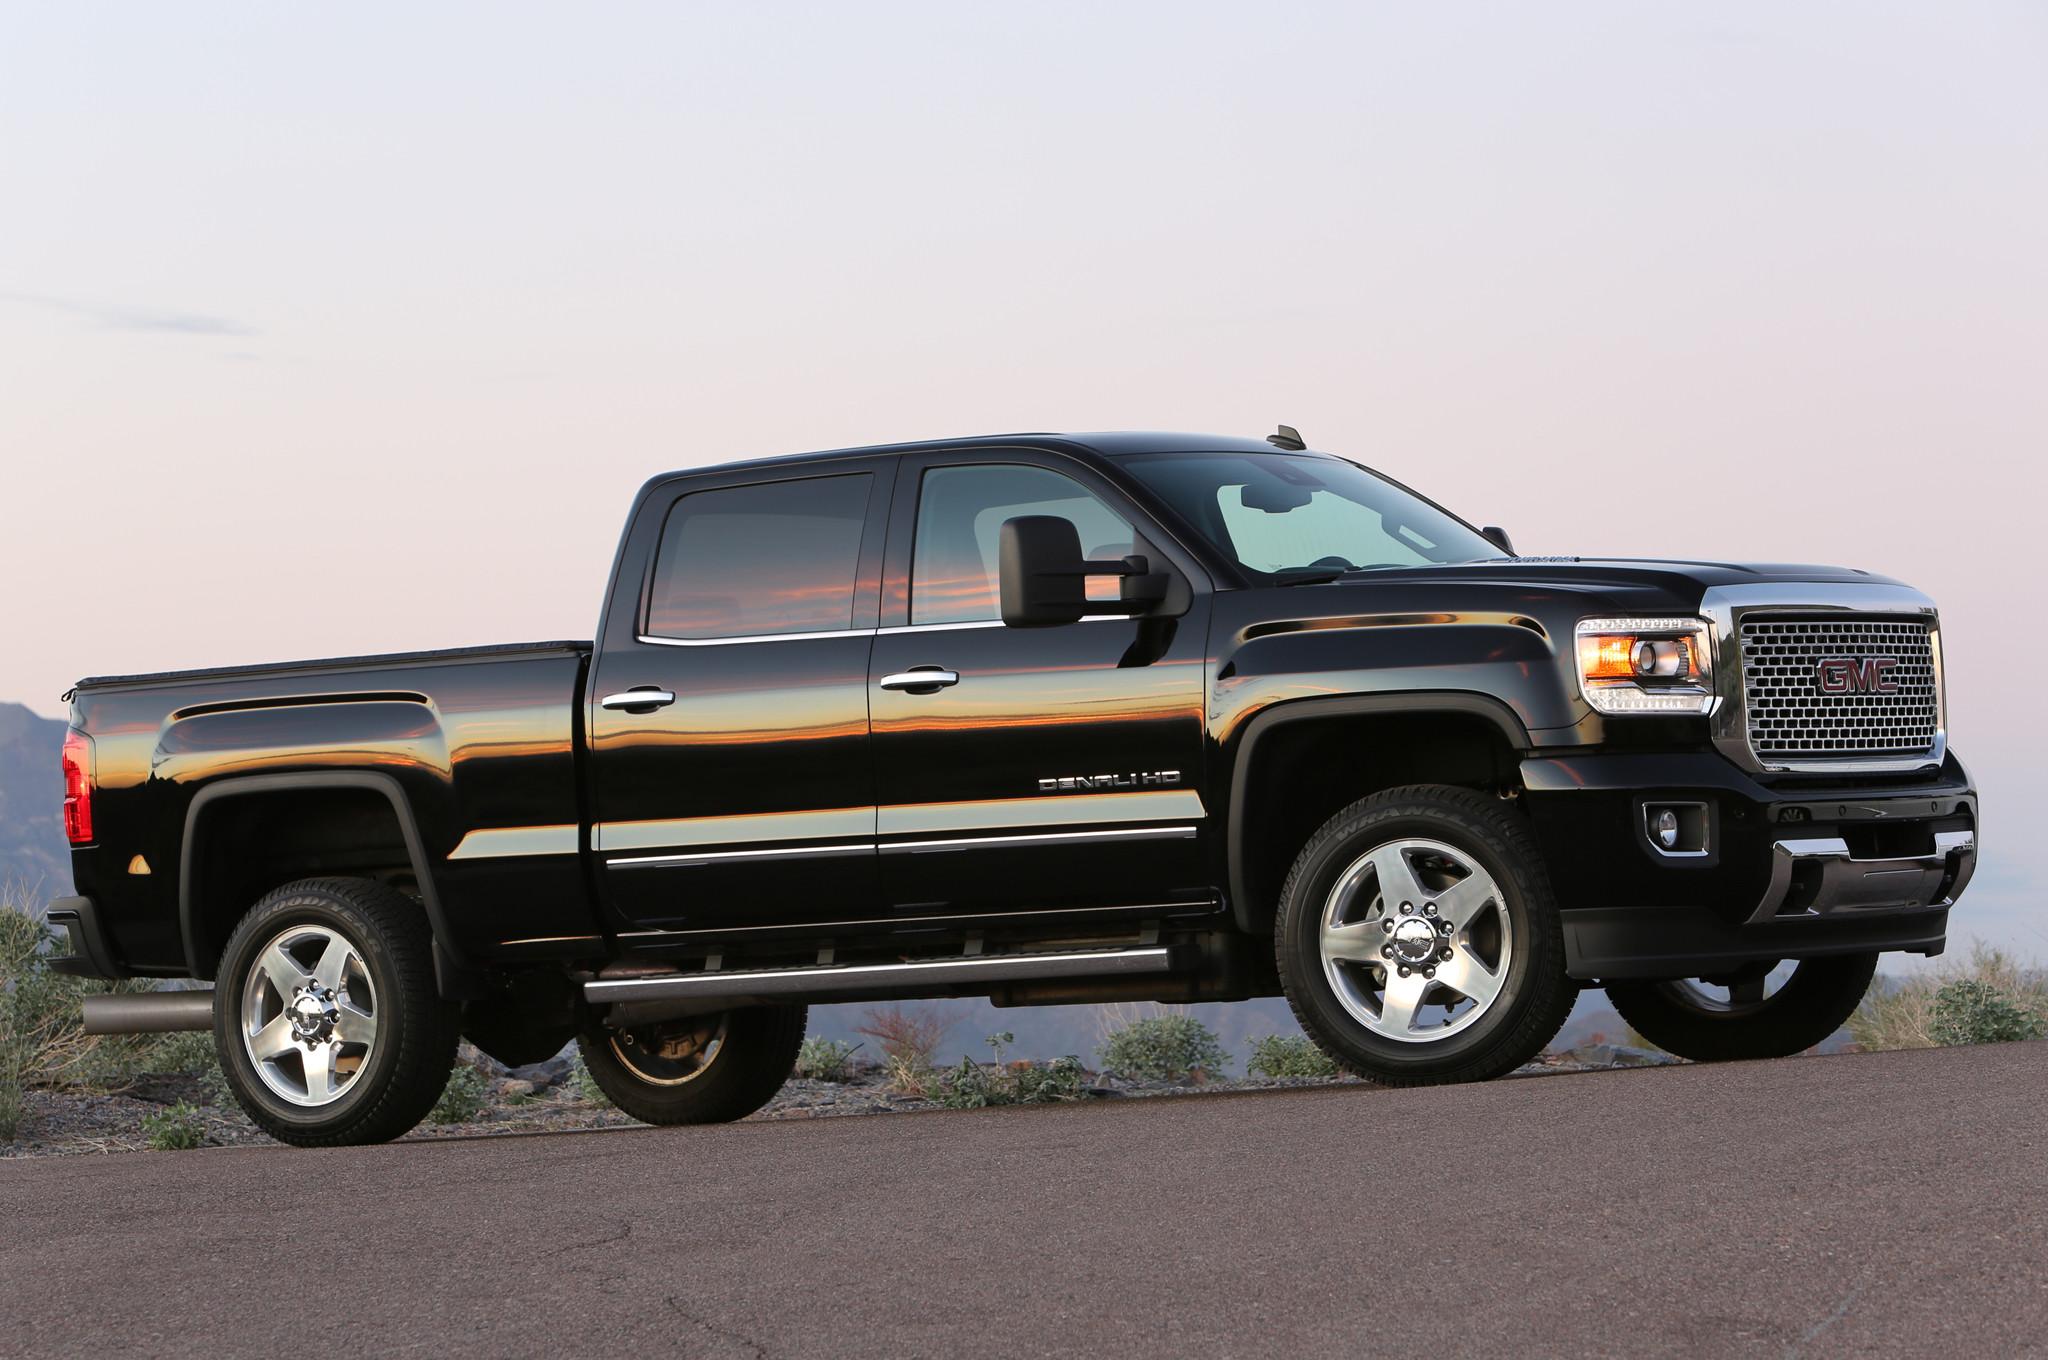 … Best Duramax Diesel For Sale About Gmc Sierra Hd Denali Front Three  Quarters View …